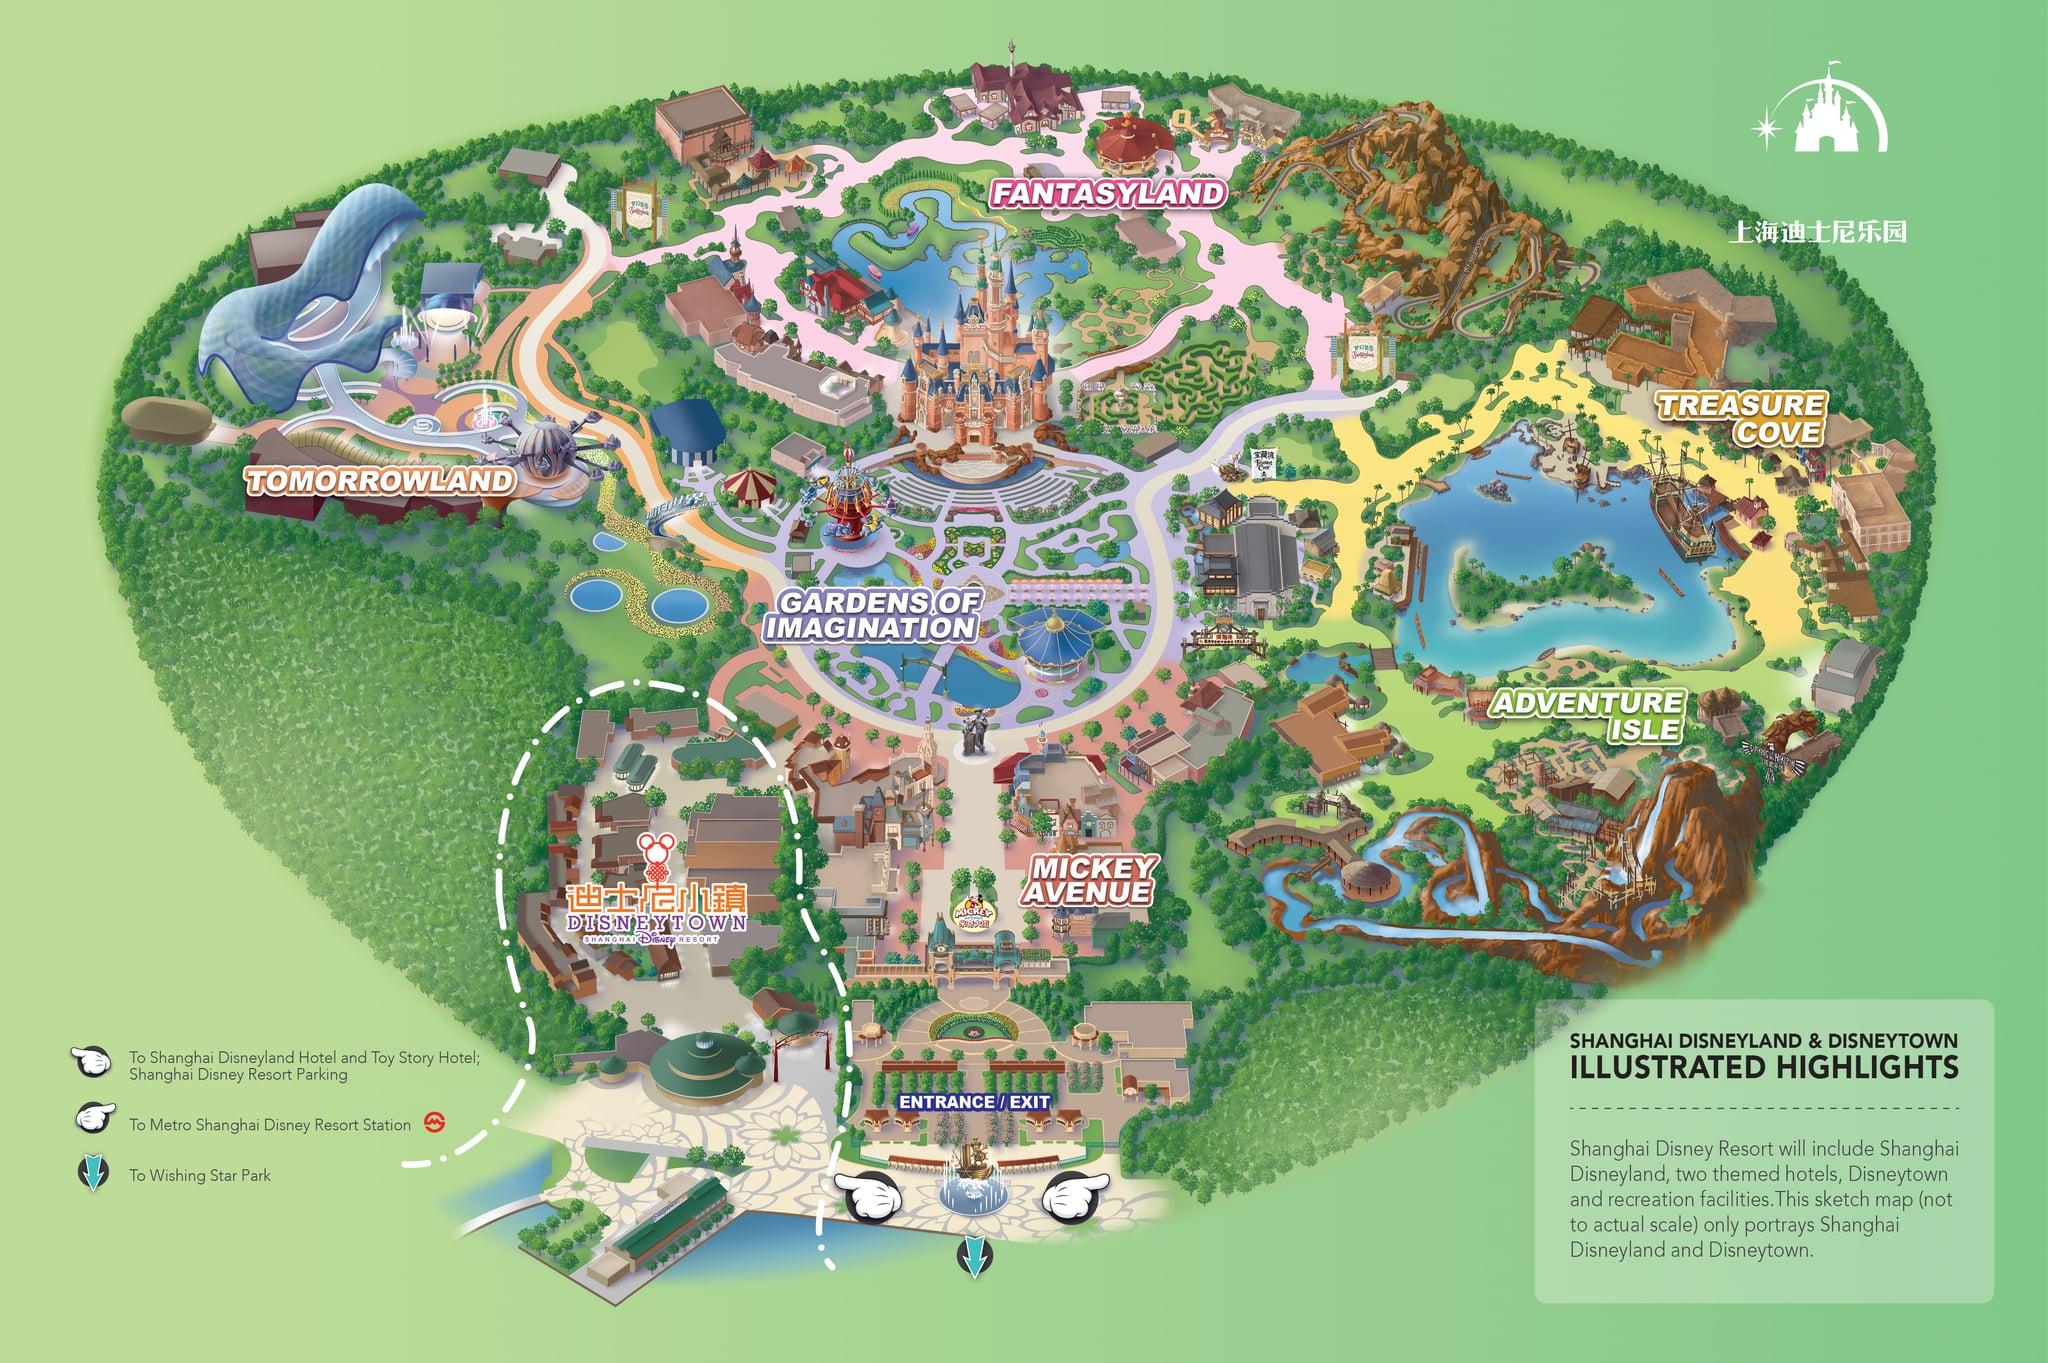 Map of Shanghai Disneyland and Disneytown | Shanghai Disney ...  Map Of Shanghai on 2015 map of london, 2015 map of asia, 2015 map of singapore,